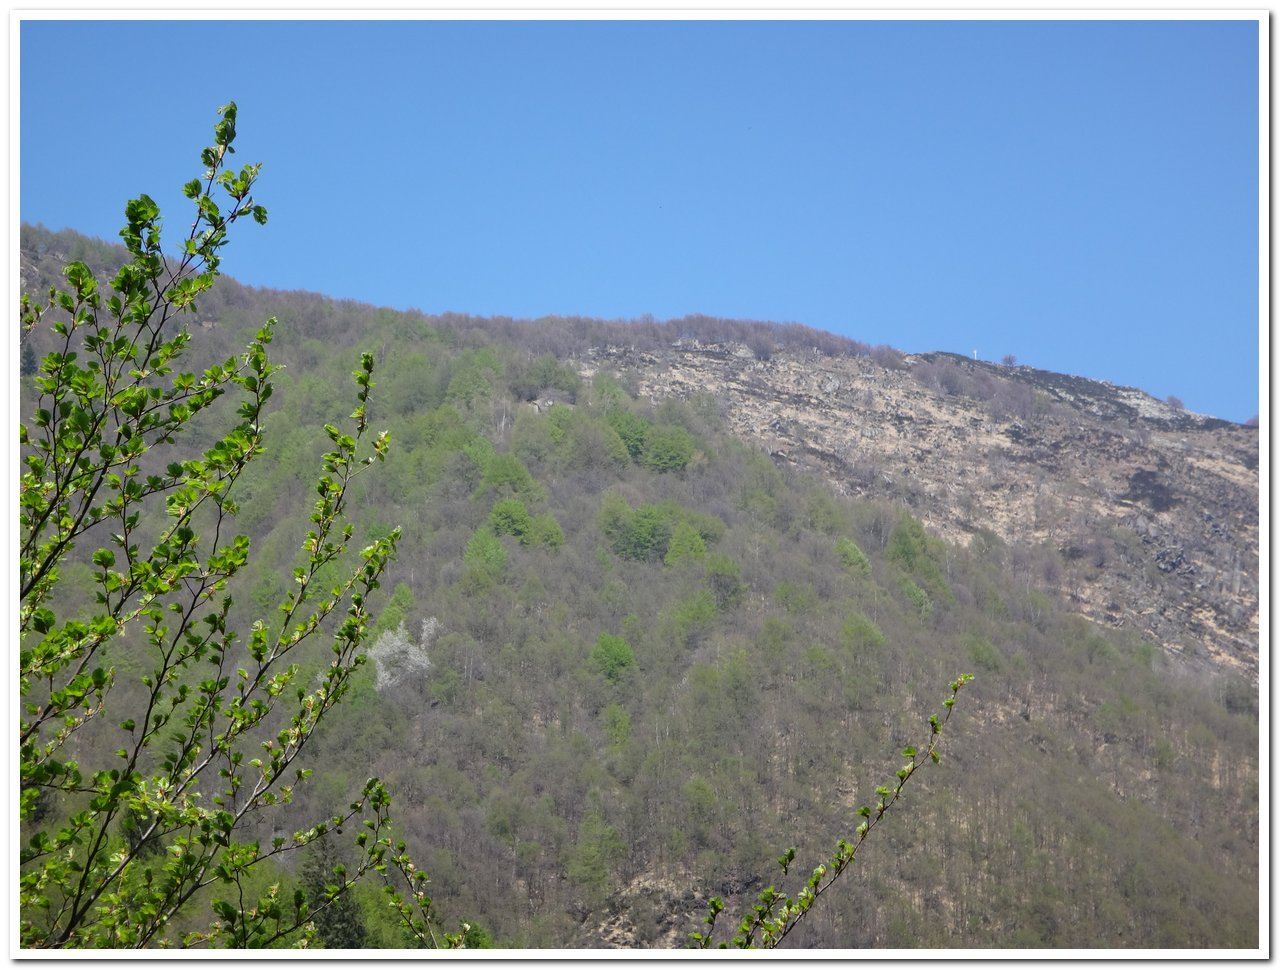 La cima vista poco oltre Drocala